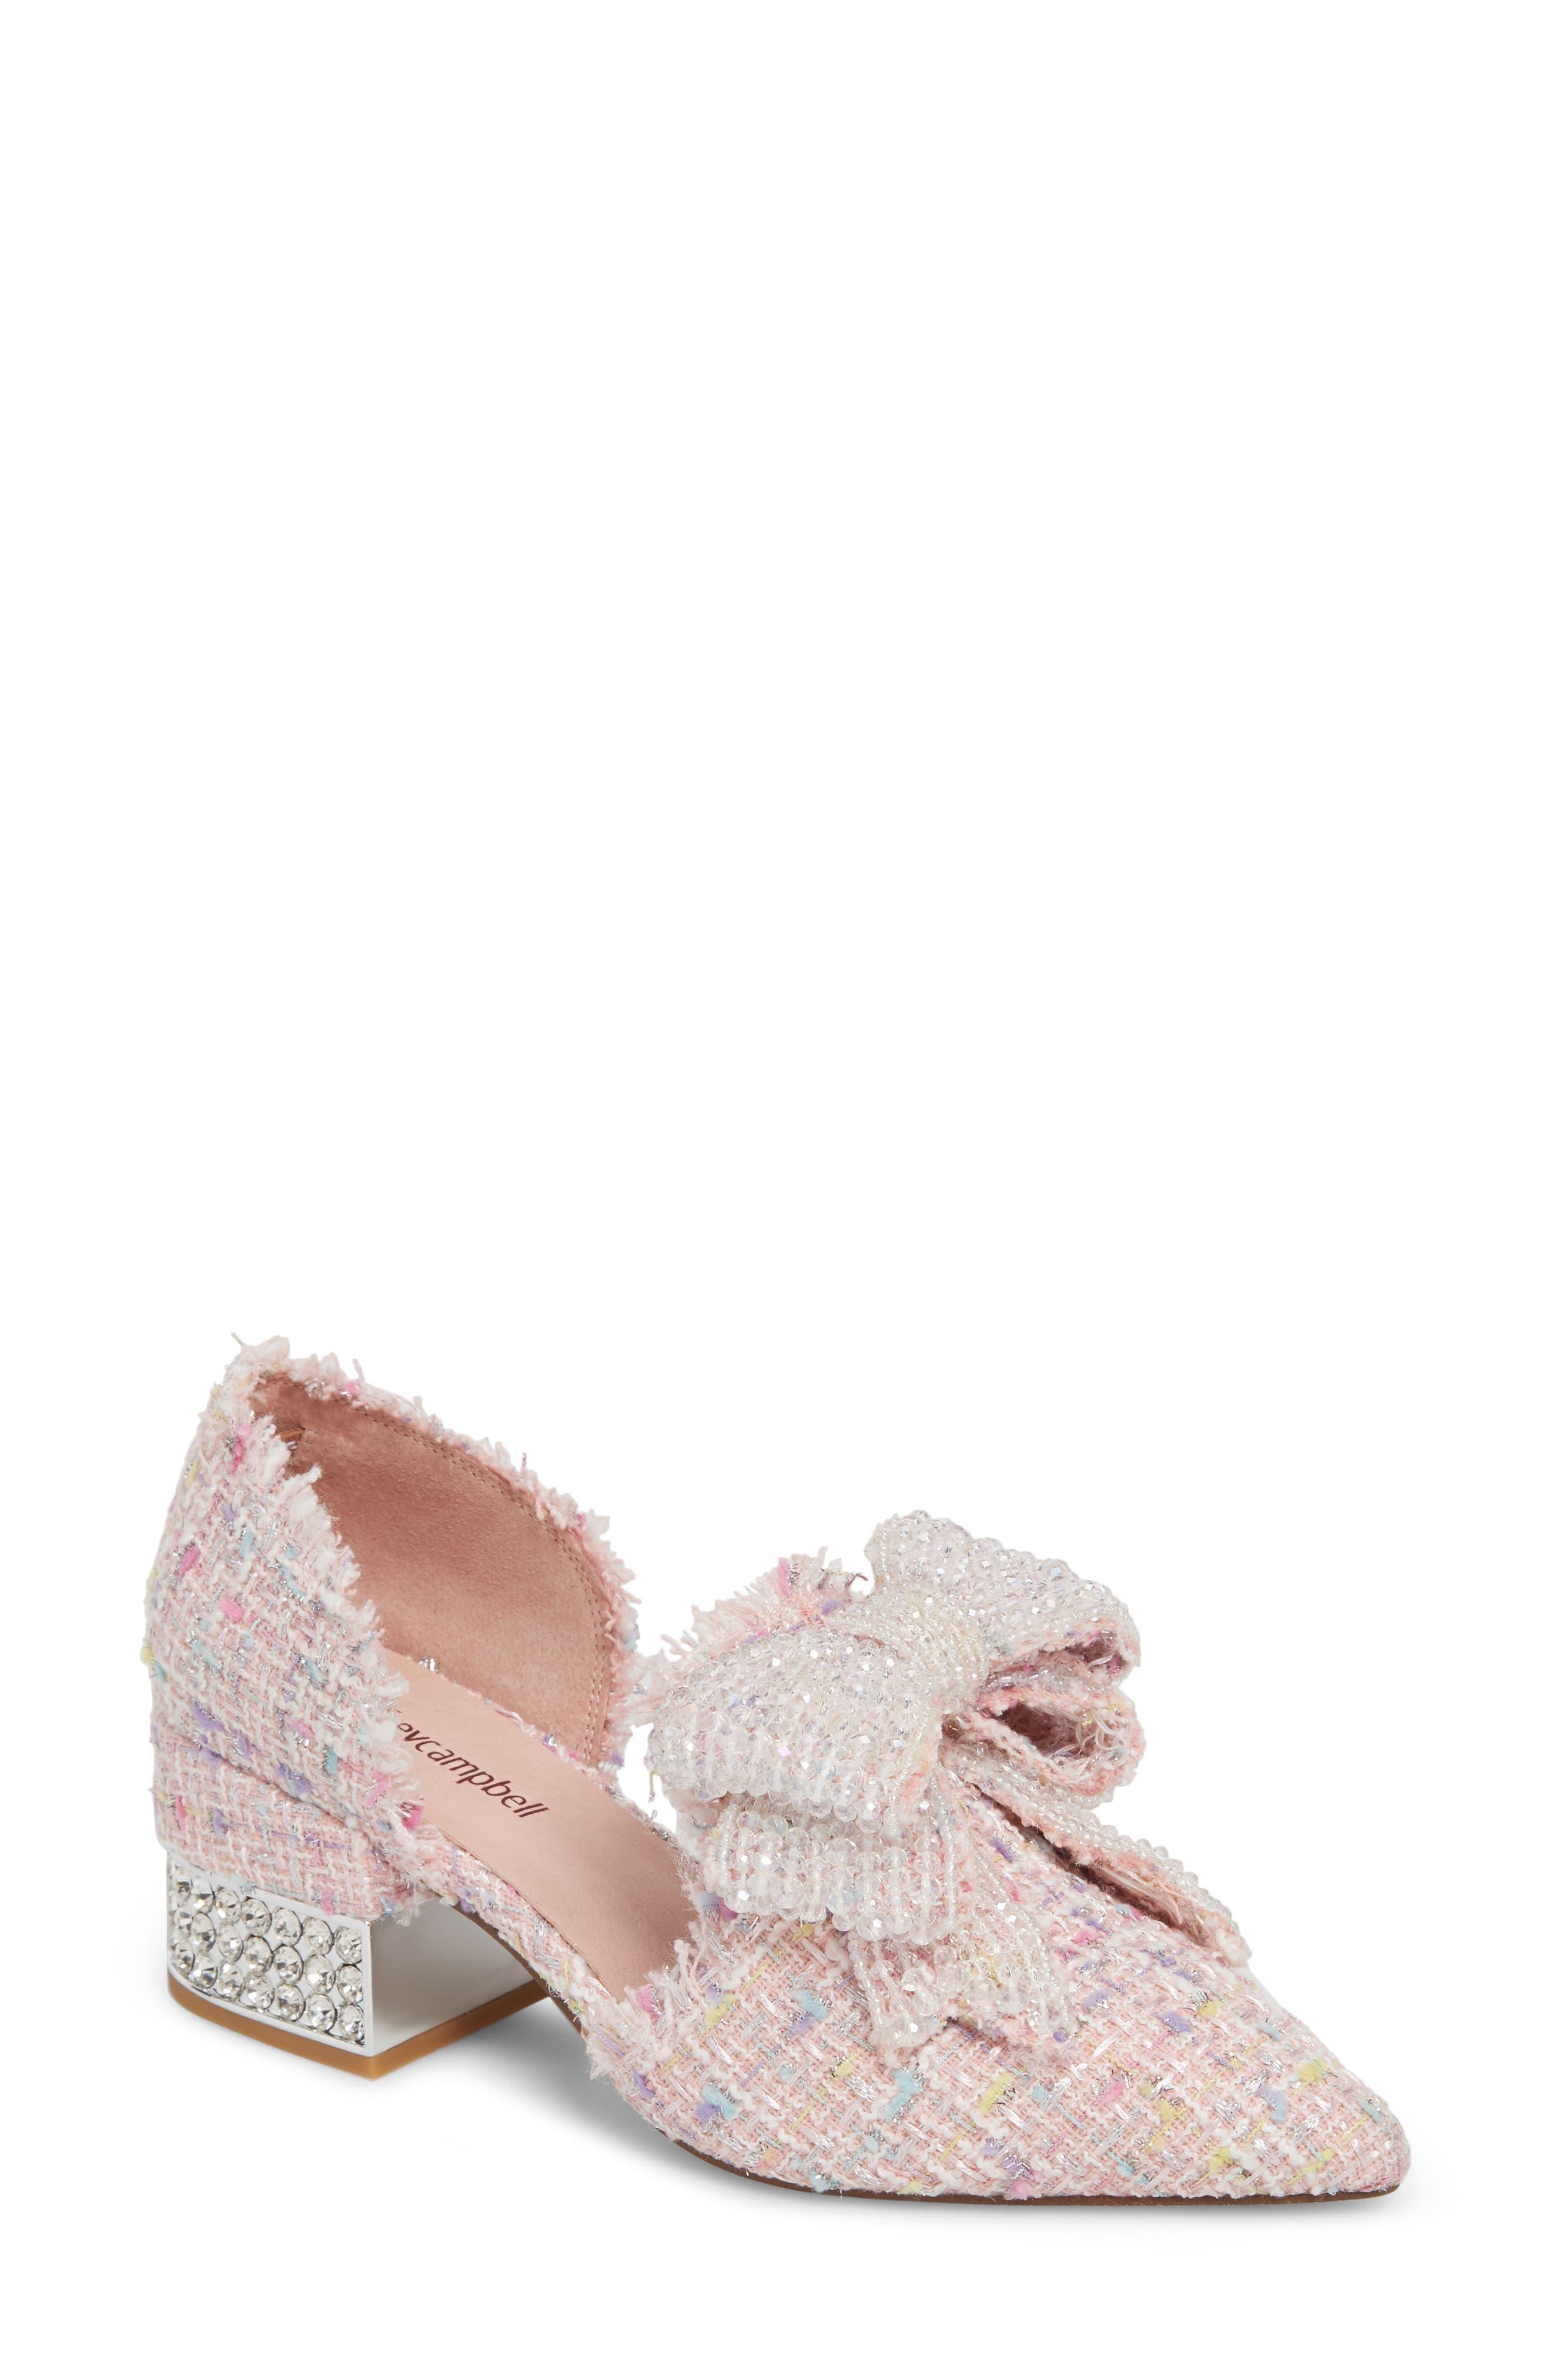 Jeffrey Campbell Valenti Embellished Bow Loafer- Pink